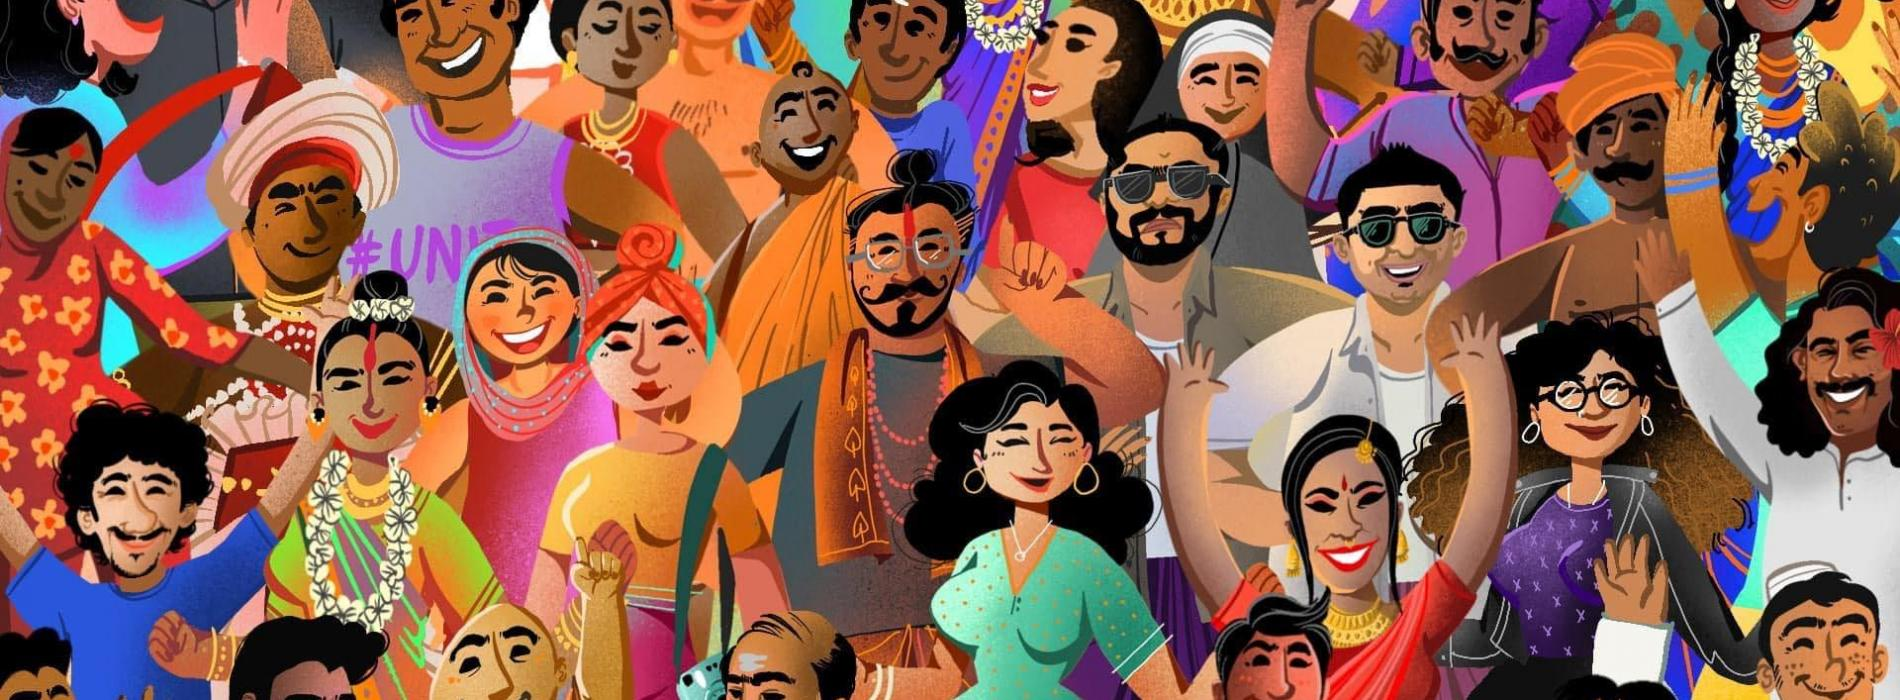 New Music : ஸ்ரீ Lanka මචං!